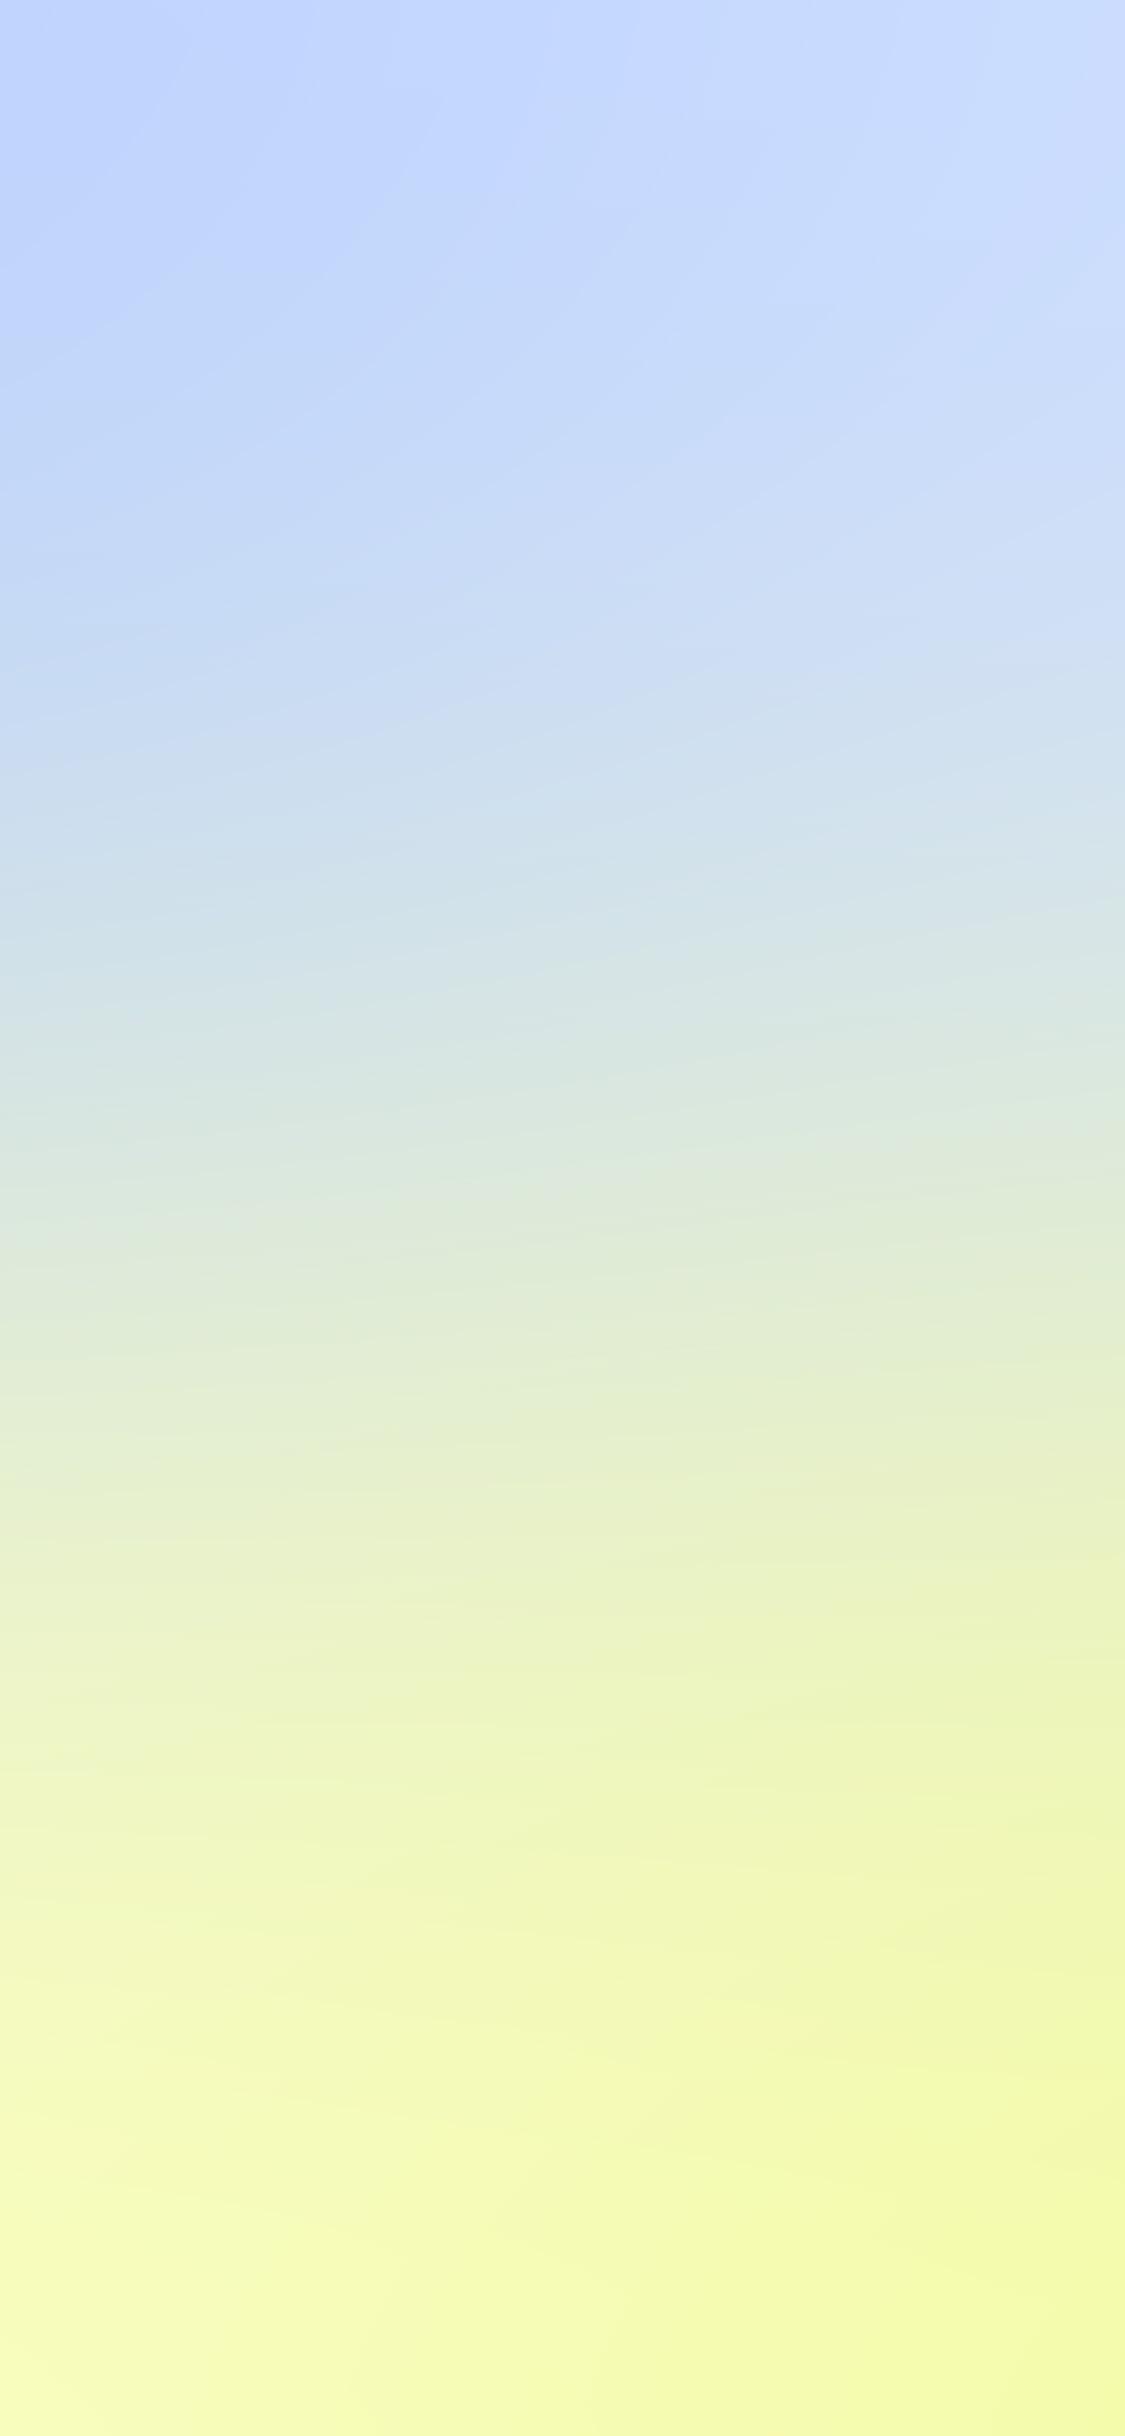 iPhonexpapers.com-Apple-iPhone-wallpaper-sn86-light-yellow-sunny-blur-gradation